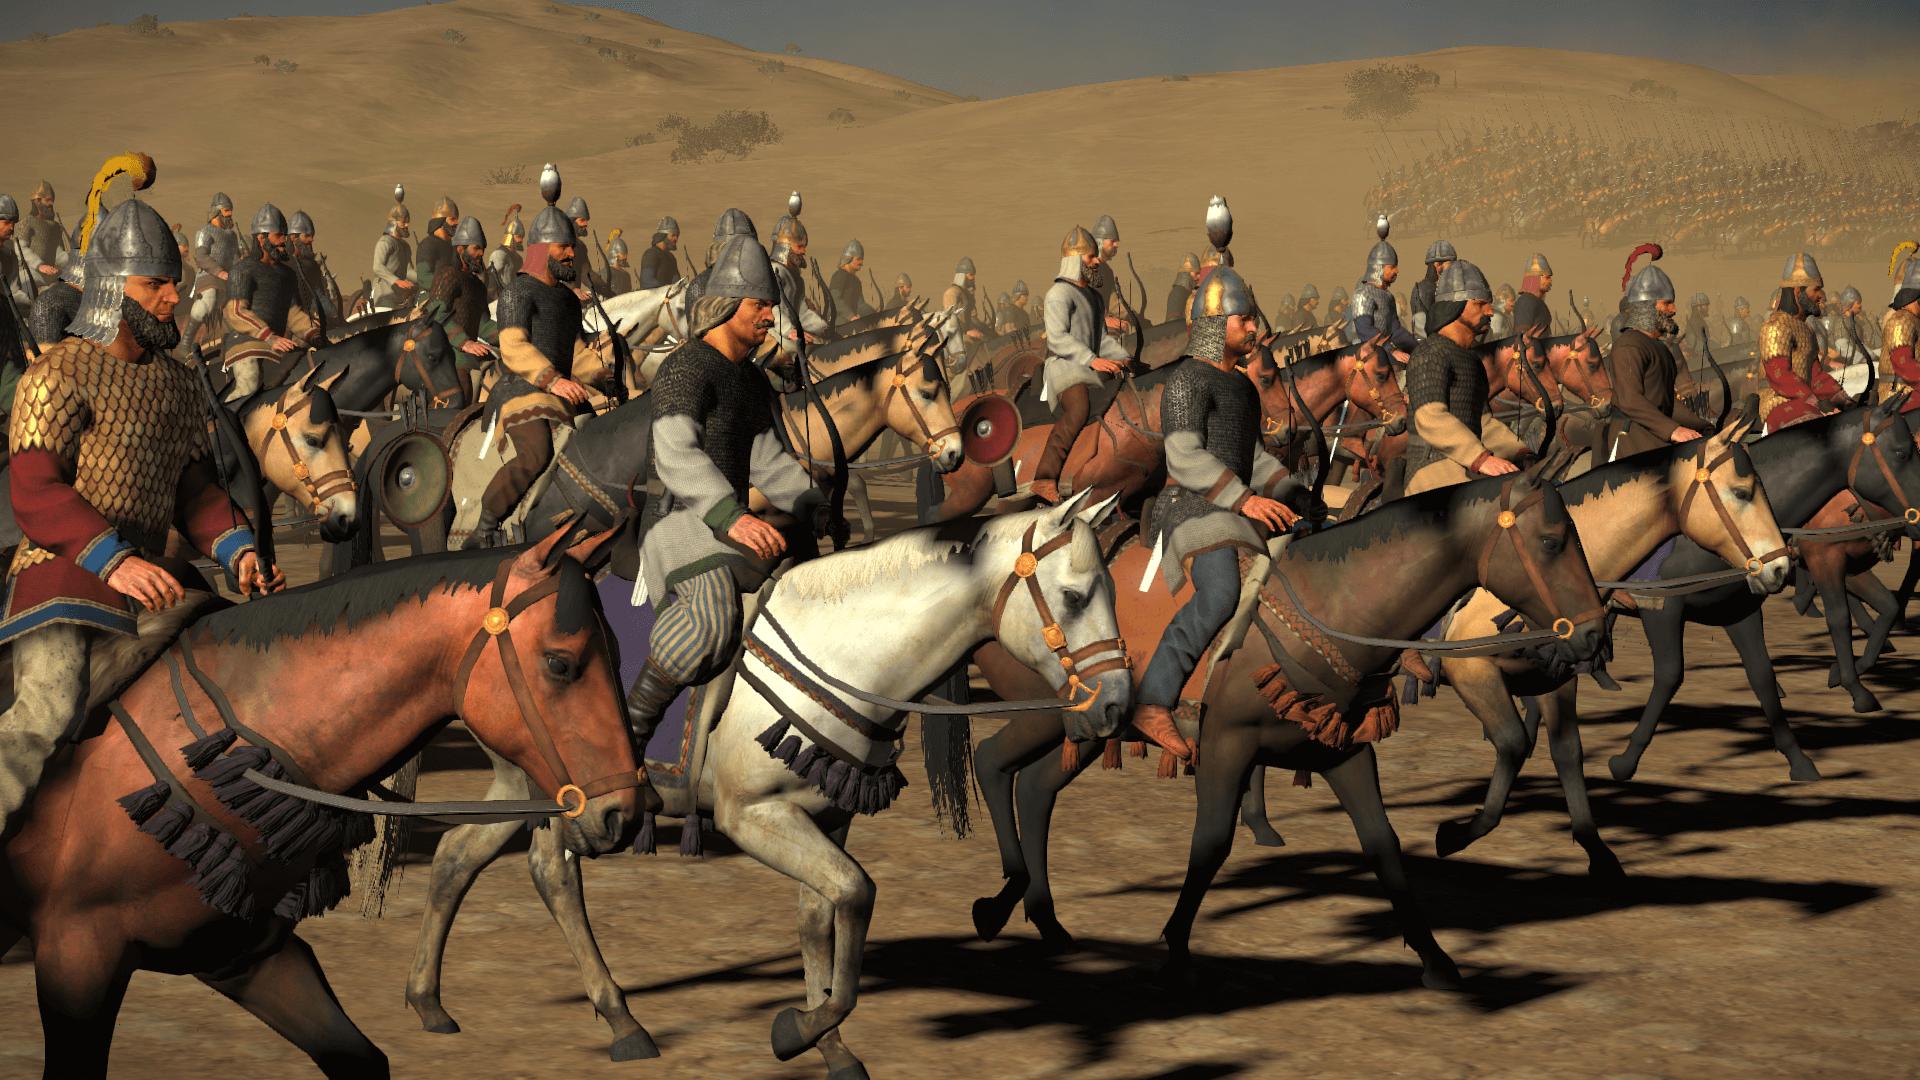 Caballería media sasánida o dehbed estaba formado por la pequeña nobleza o dekhan